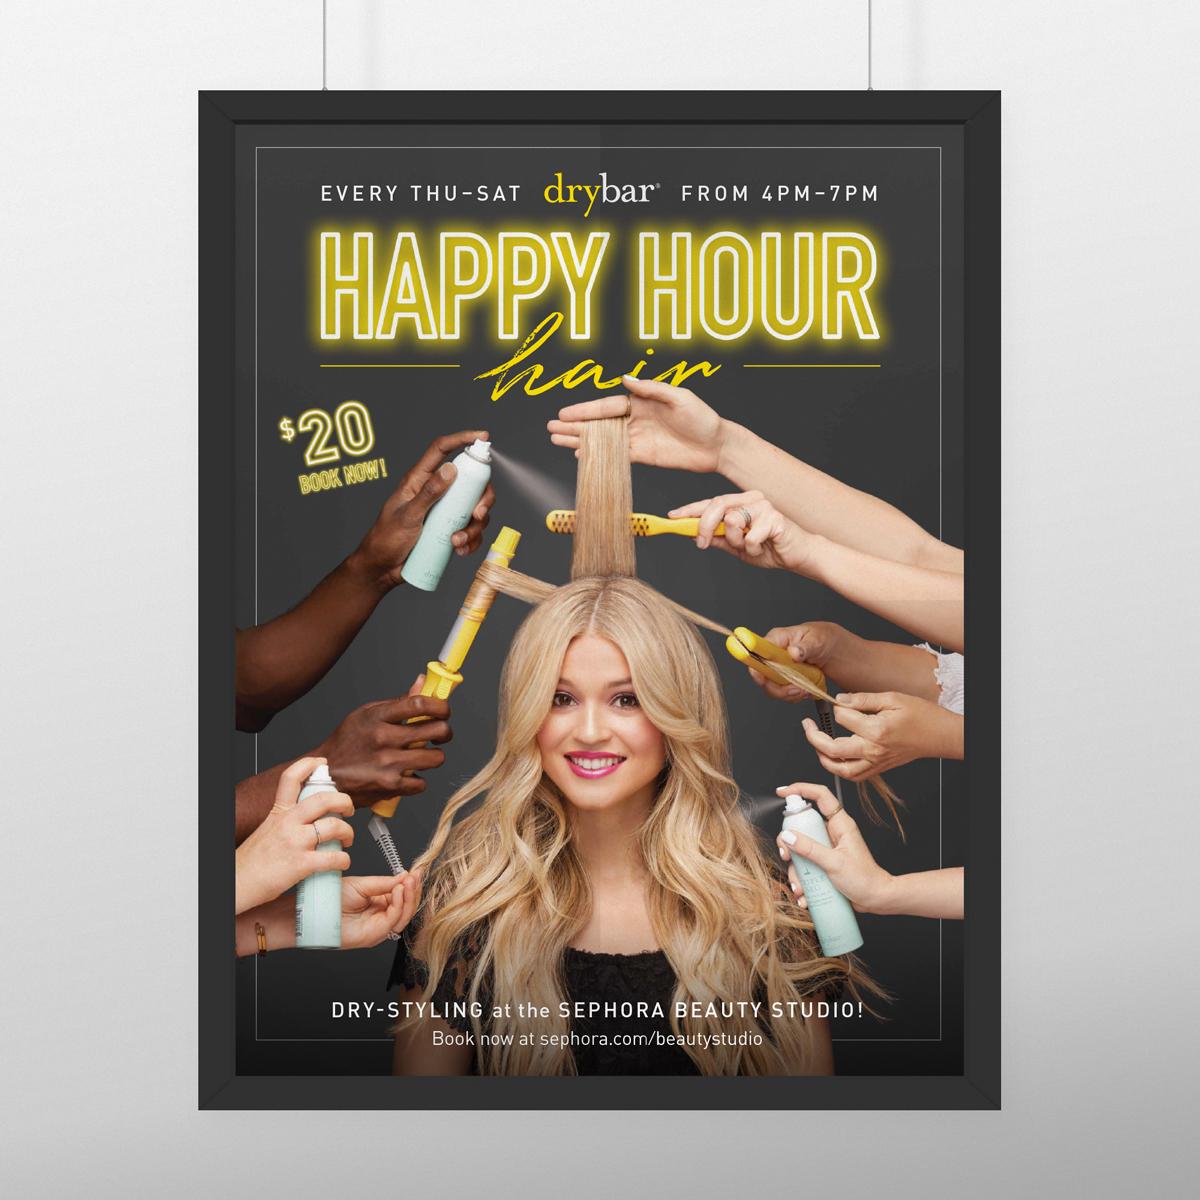 HHH_Poster_Front_Mockup.jpg